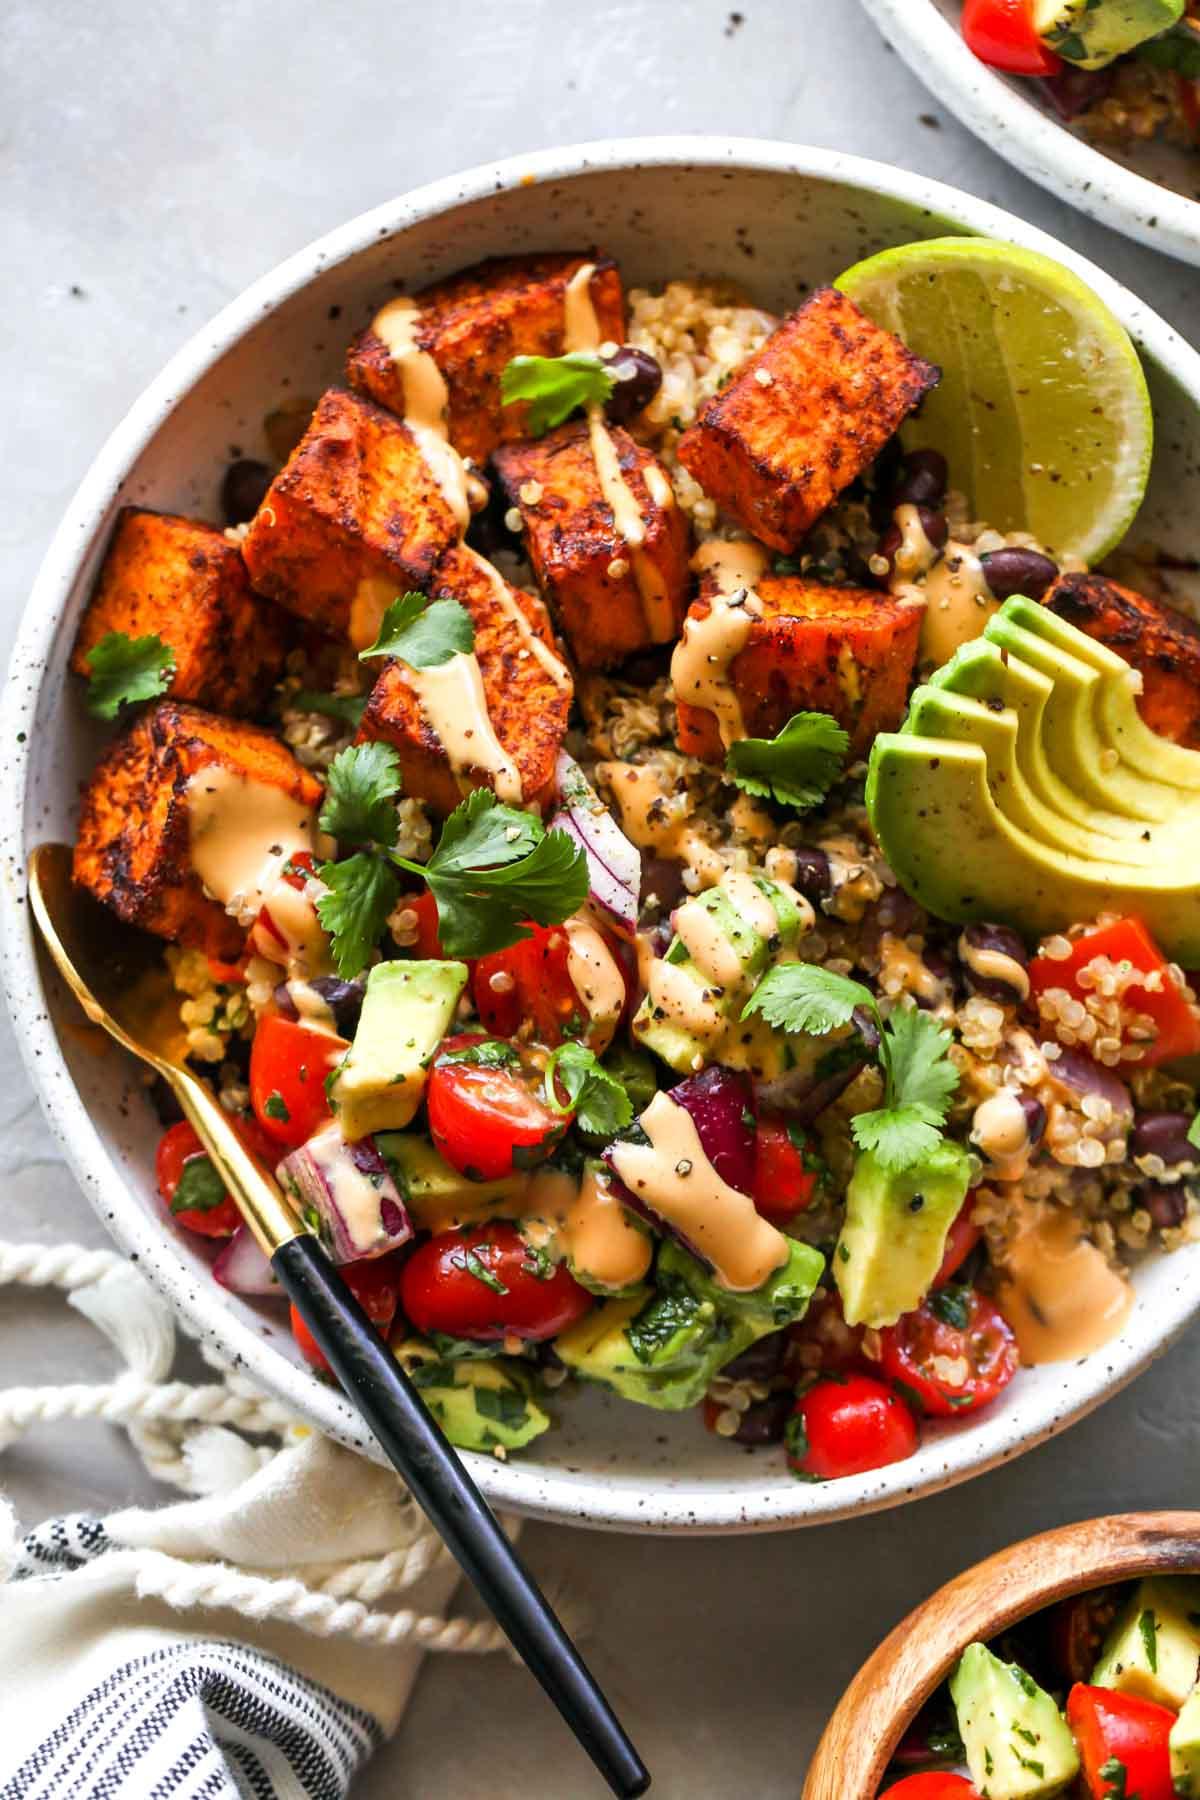 Sweet potatoes, quinoa, black beans, and pico de gallo in a white bowl